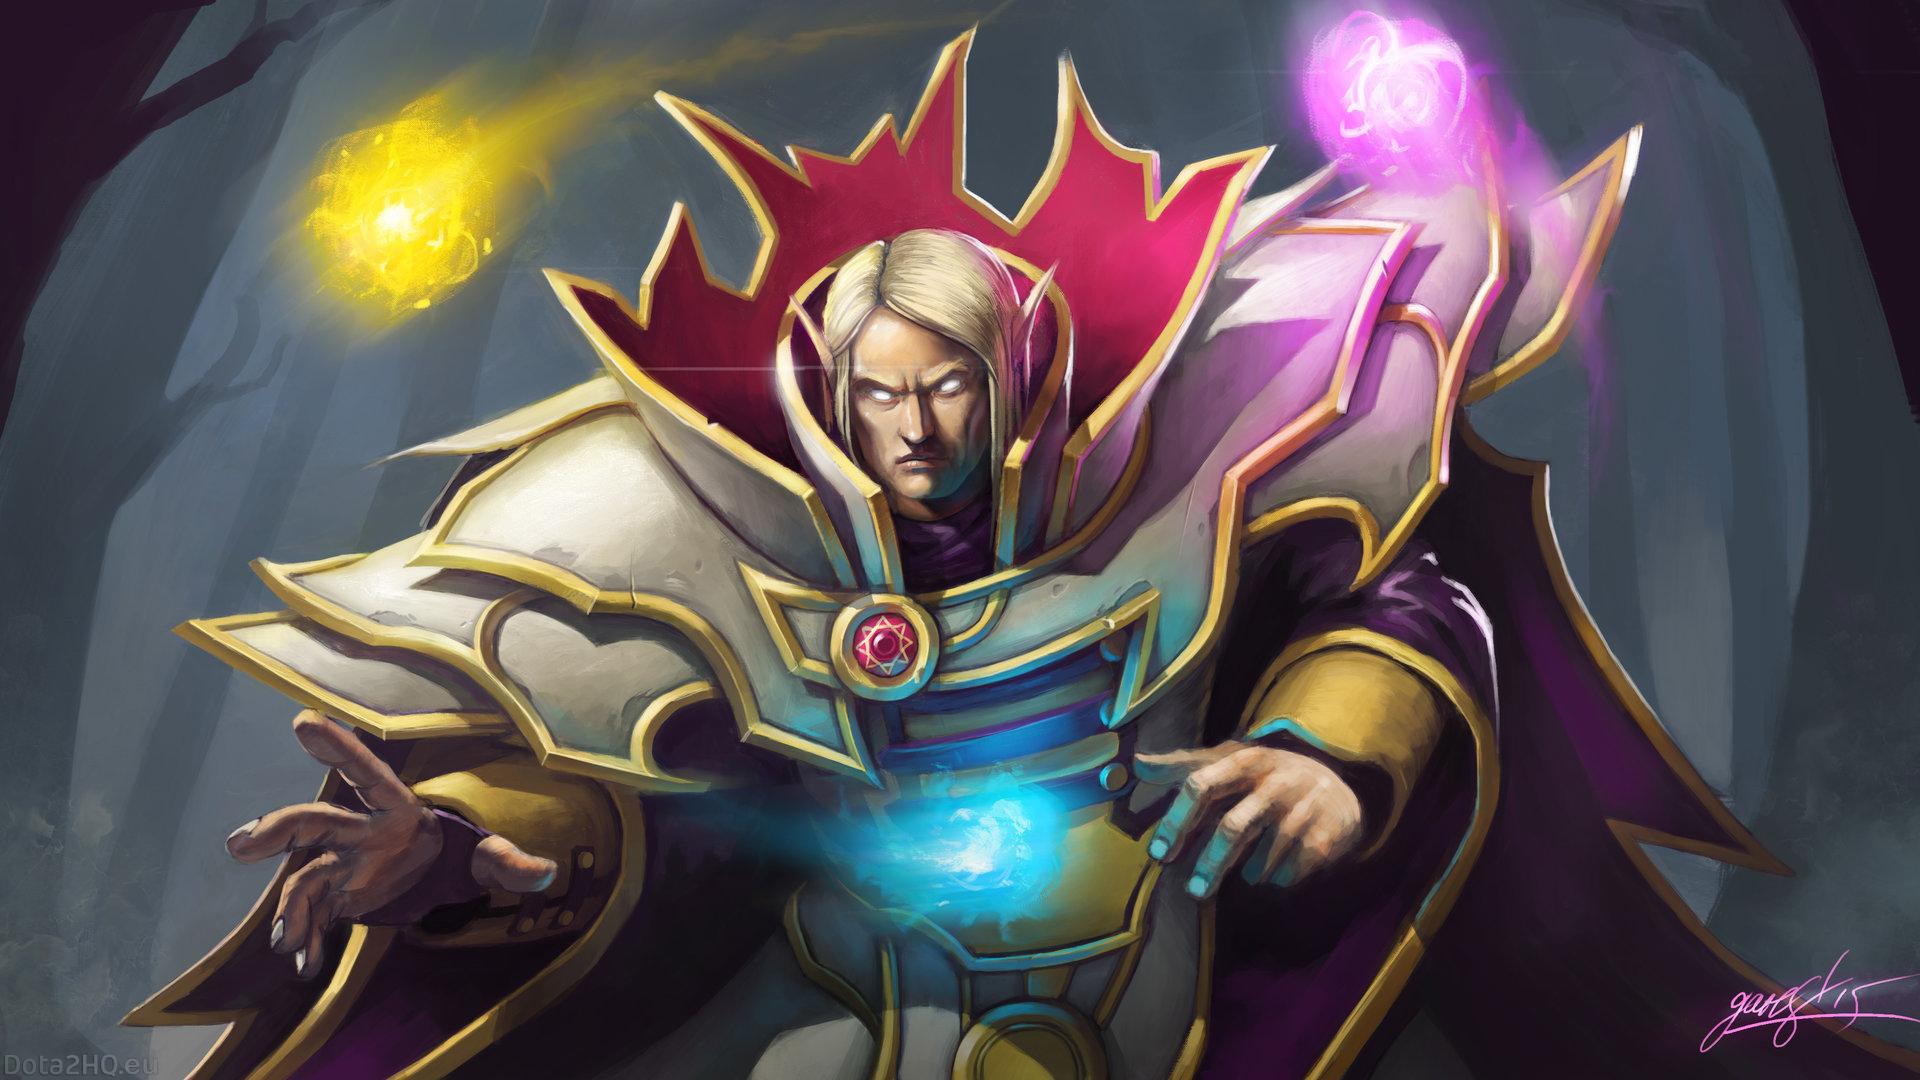 Heroes Dota 2 Invoker , HD Wallpaper & Backgrounds